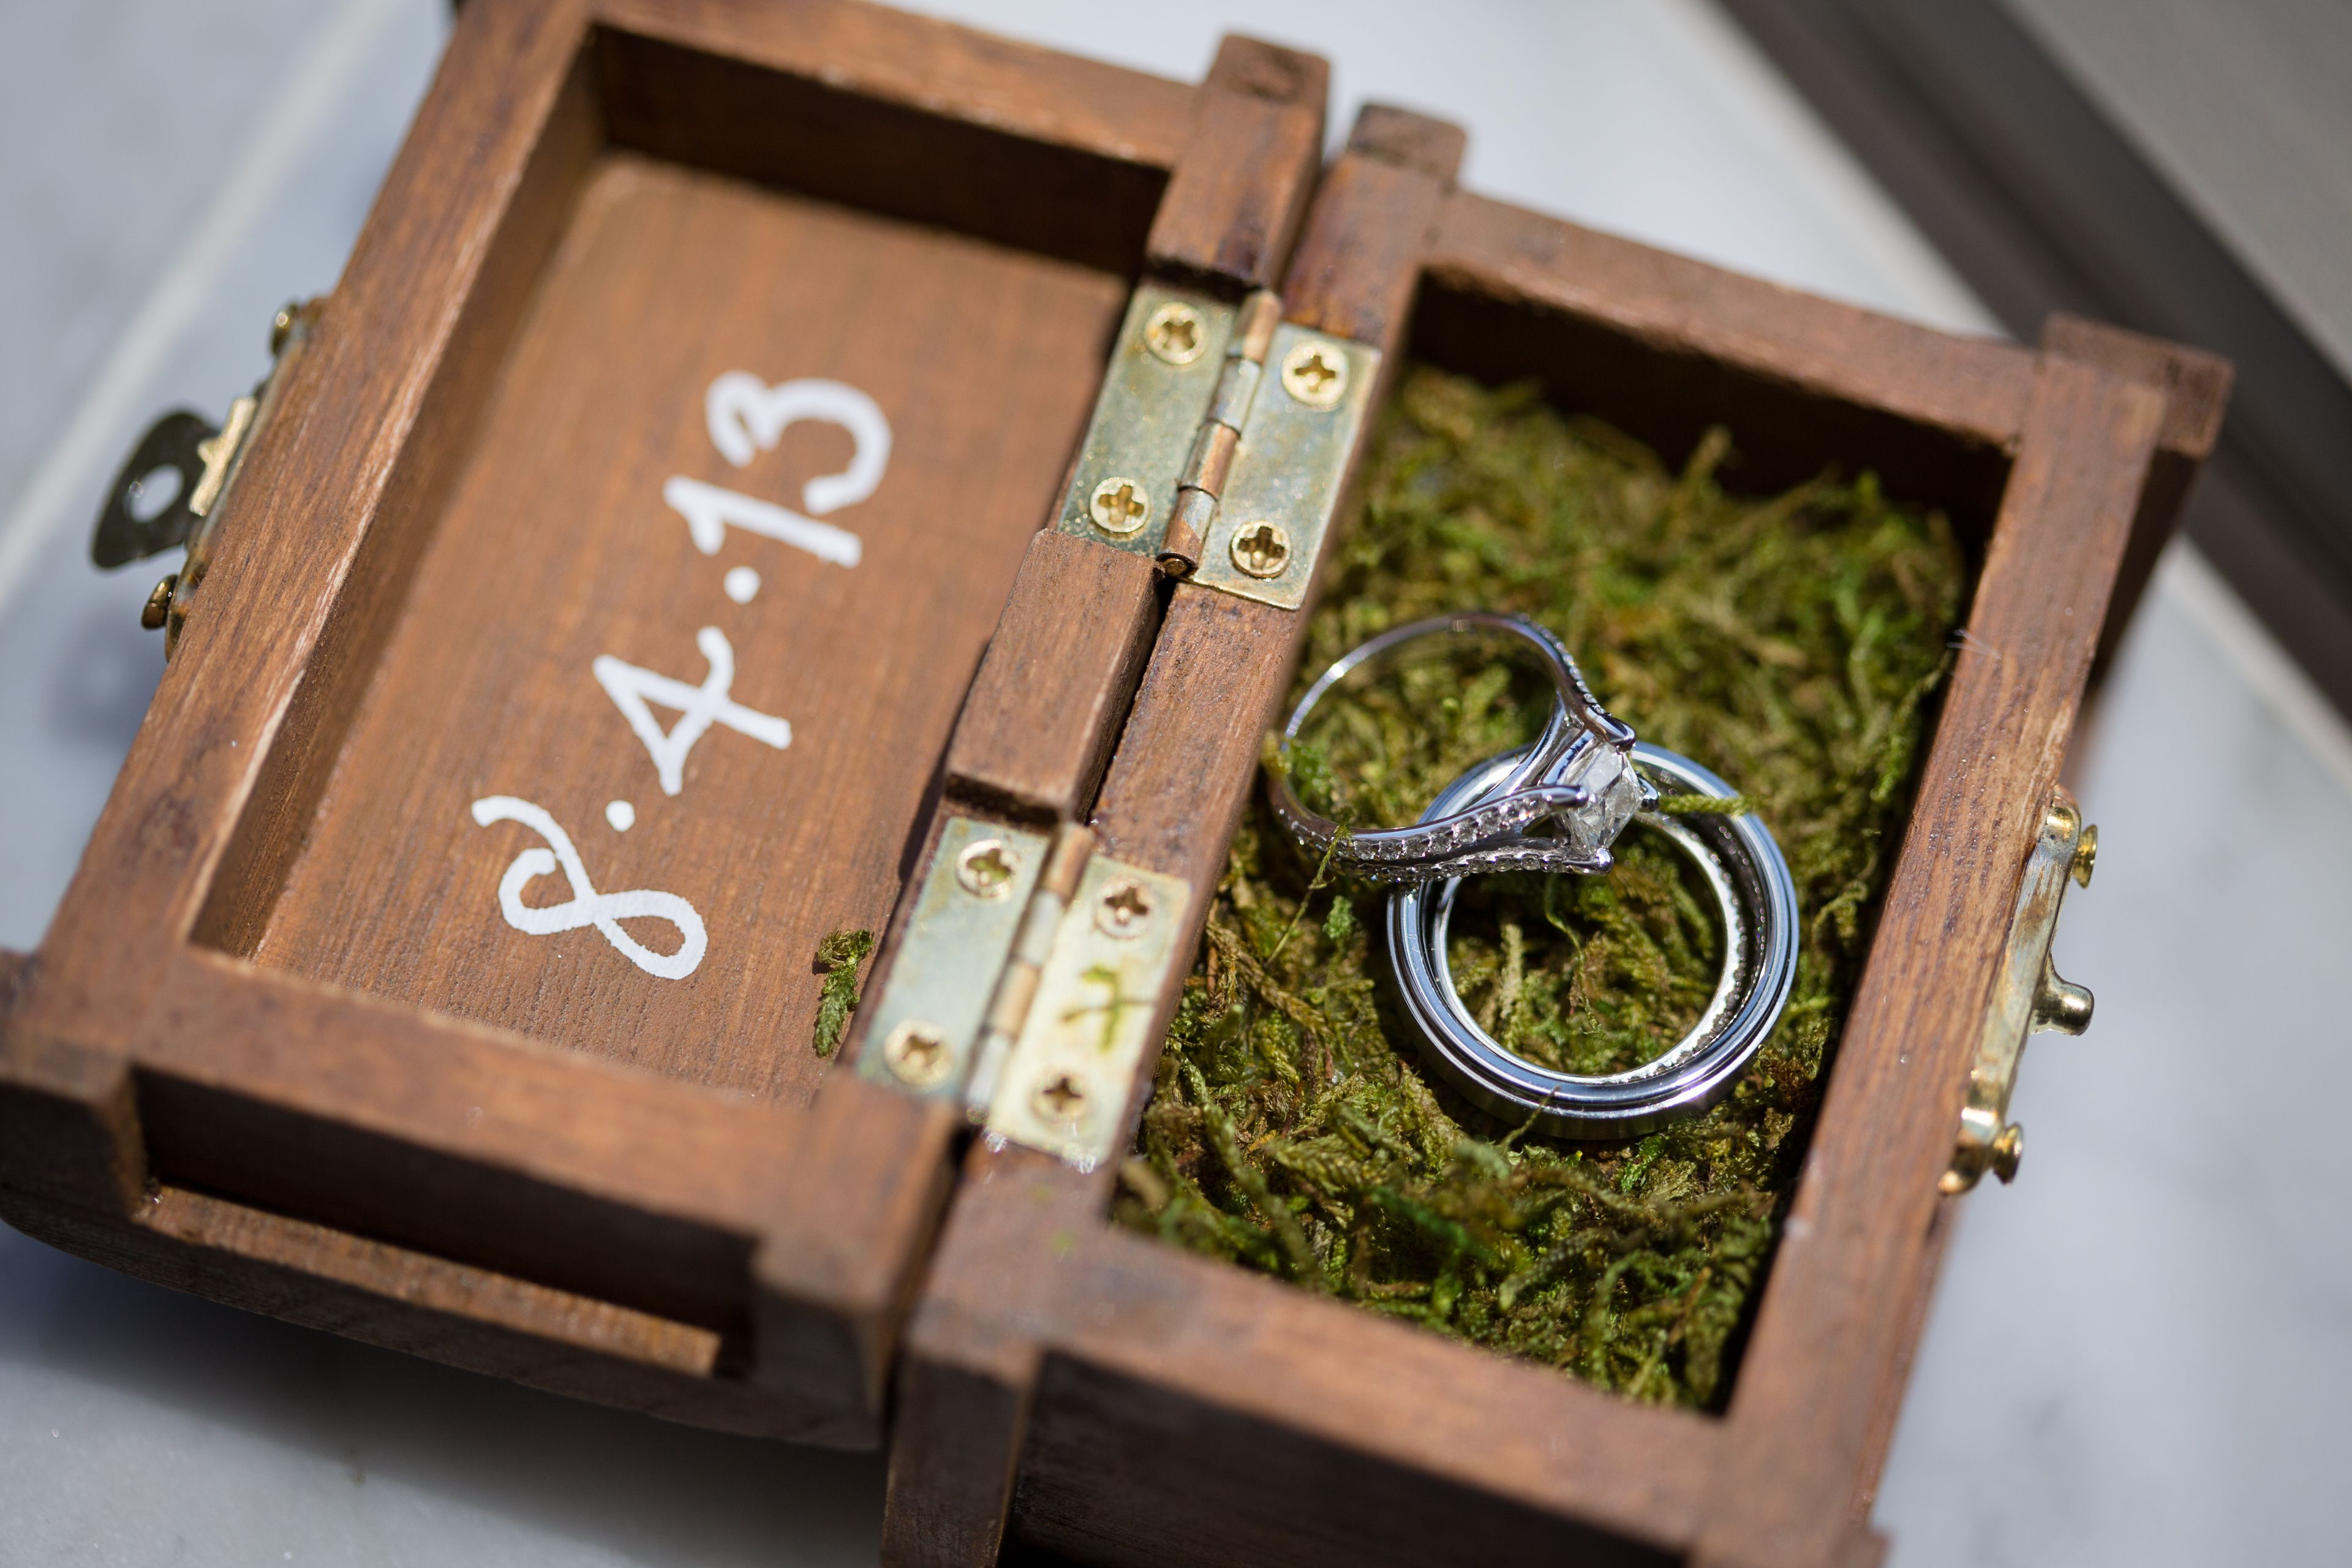 Wedding Ring Box Diy Cute Wood Box Sand Paper Wood Stain Paint